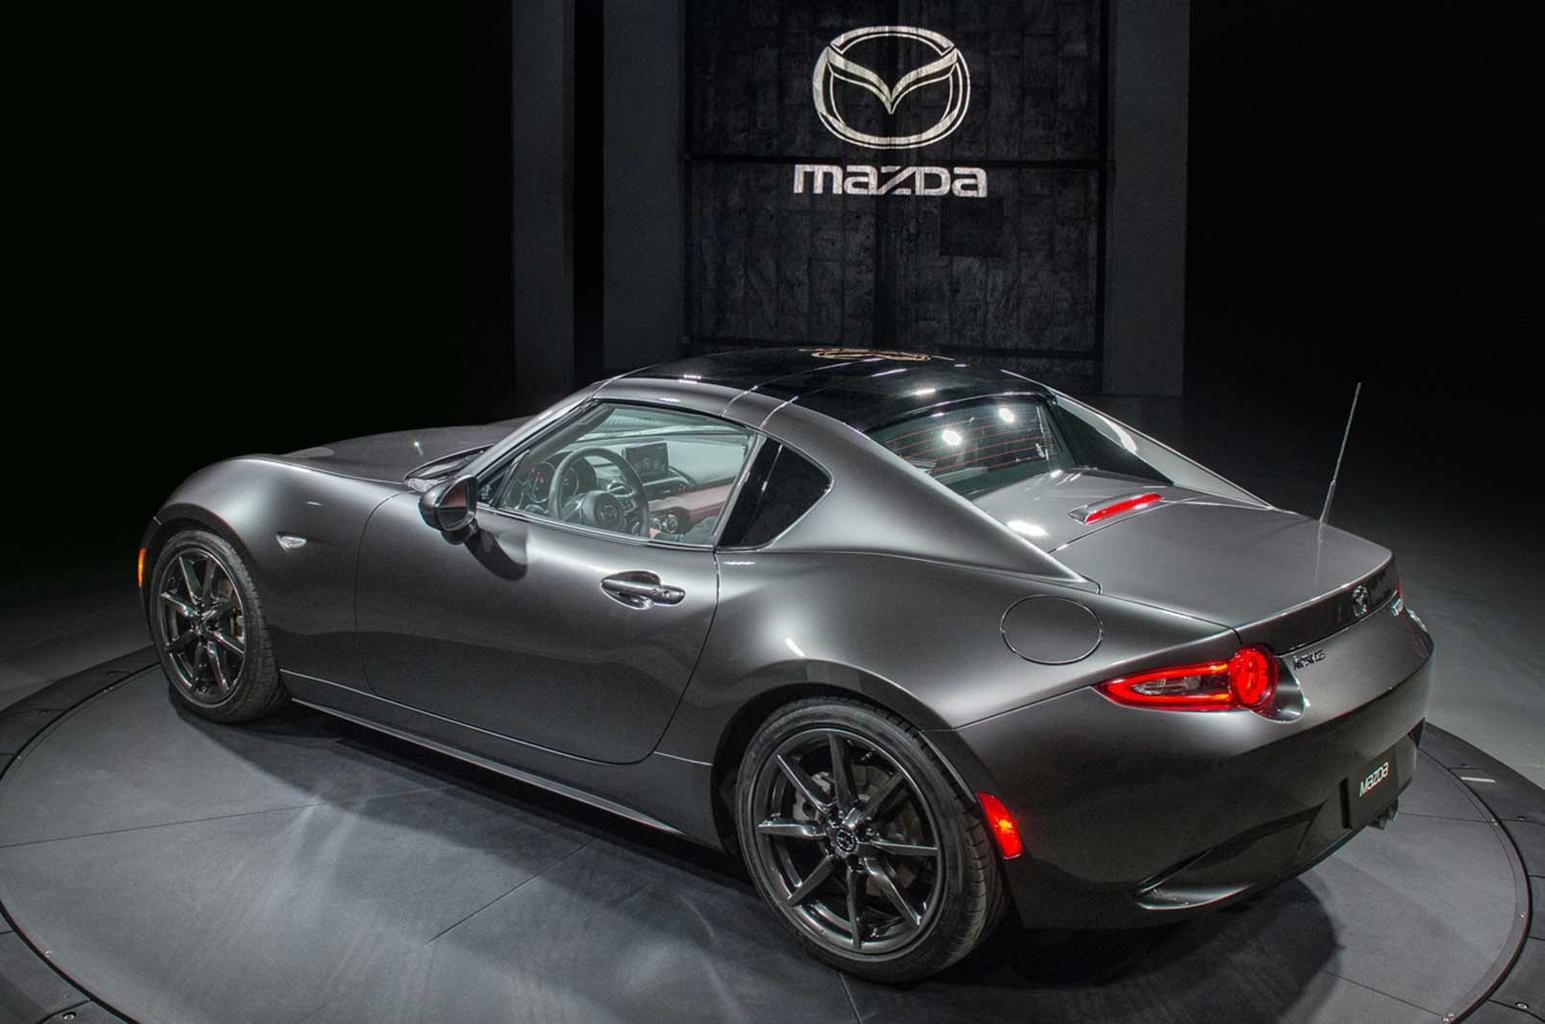 New Mazda MX-5 RF priced from £22,195